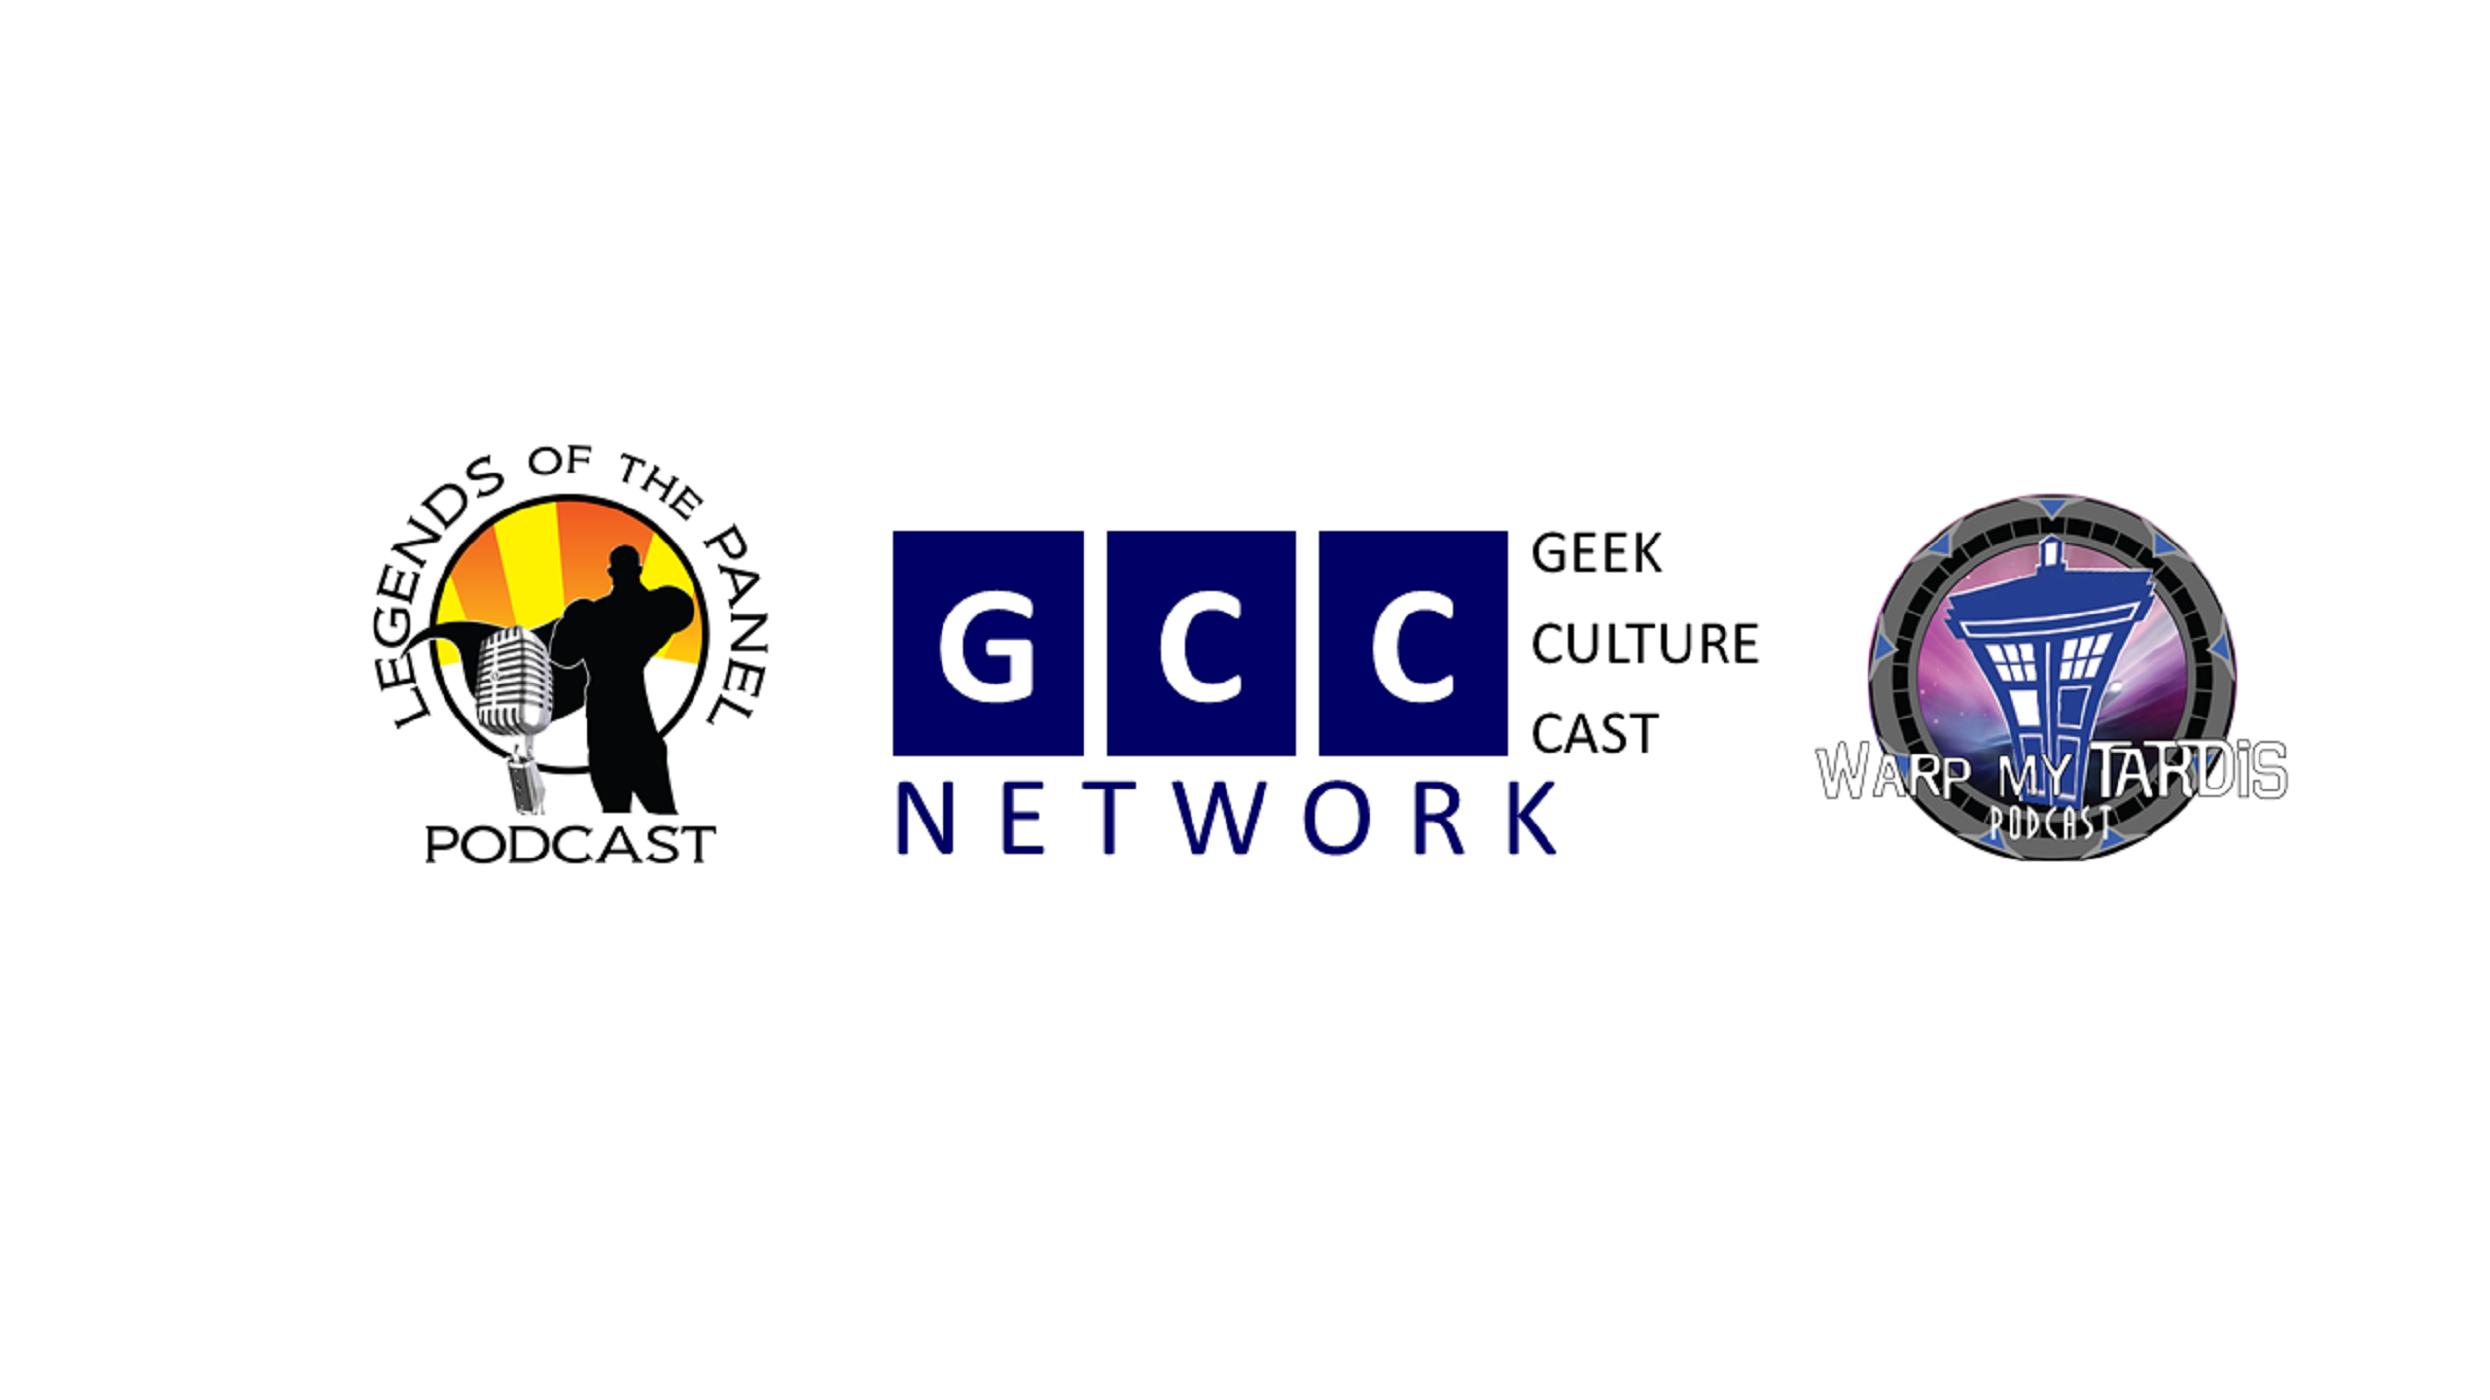 Geek Culture Cast